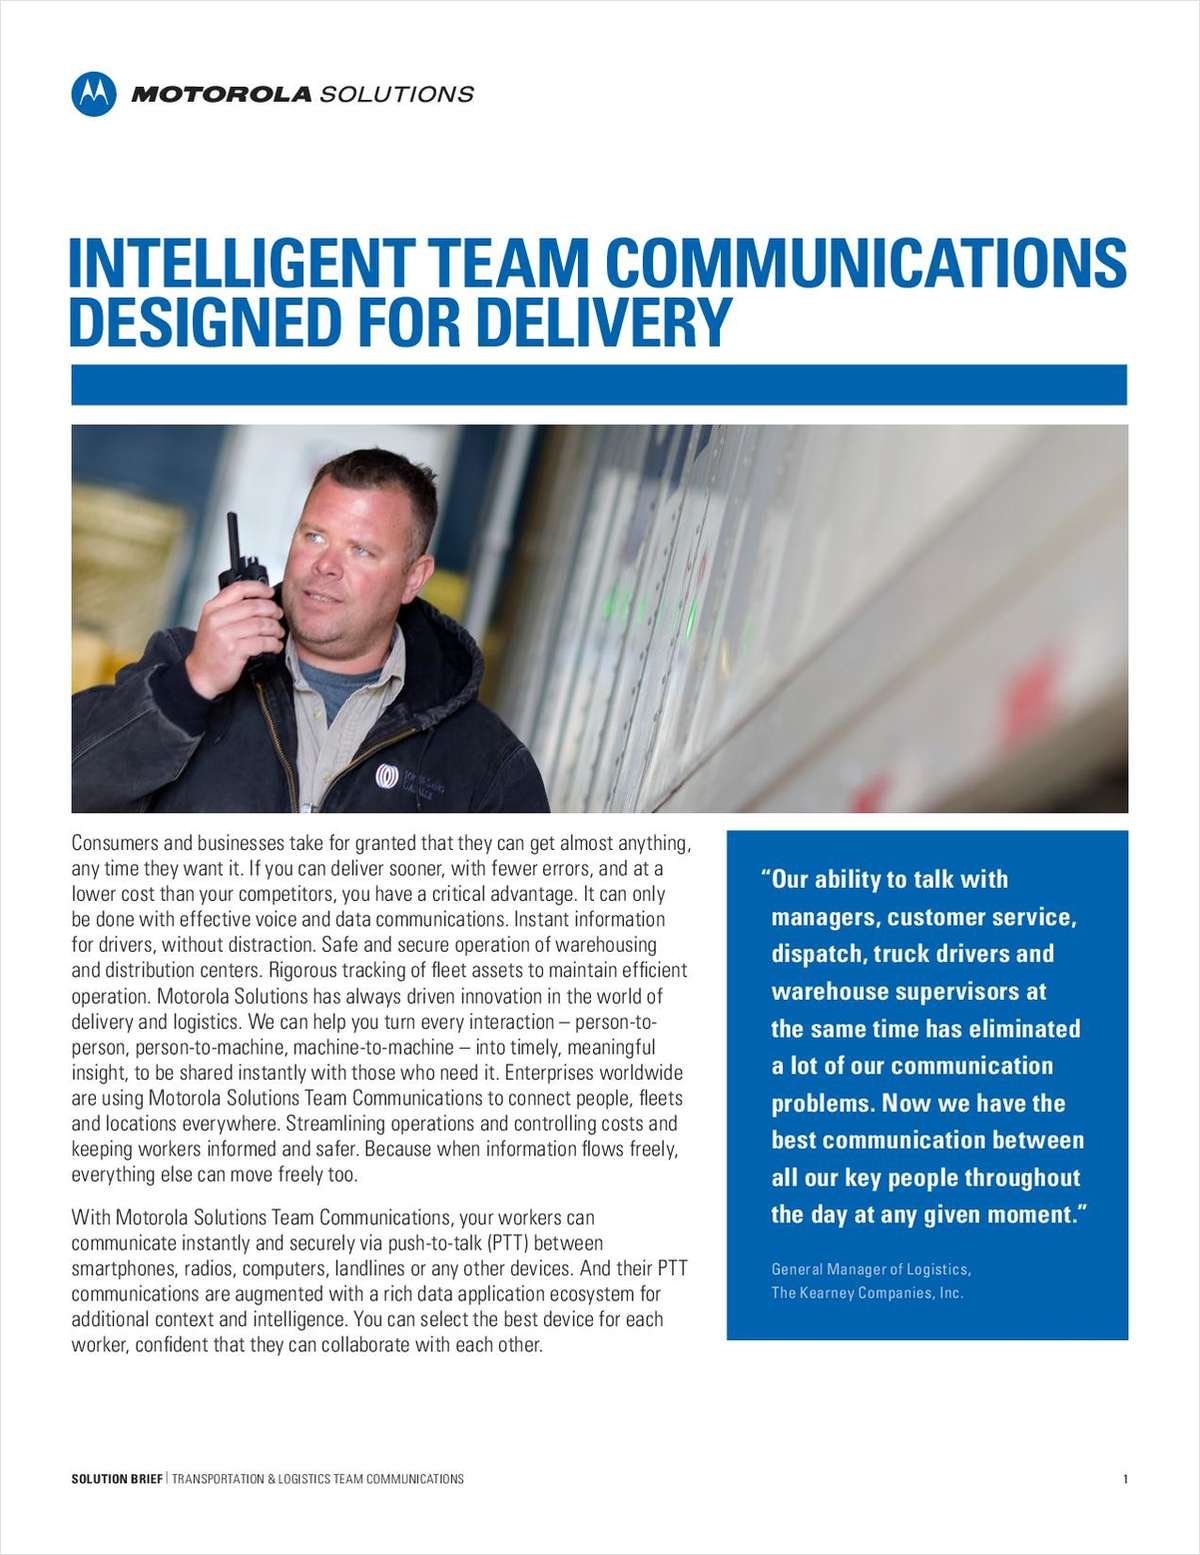 Intelligent Team Communications Designed for Delivery